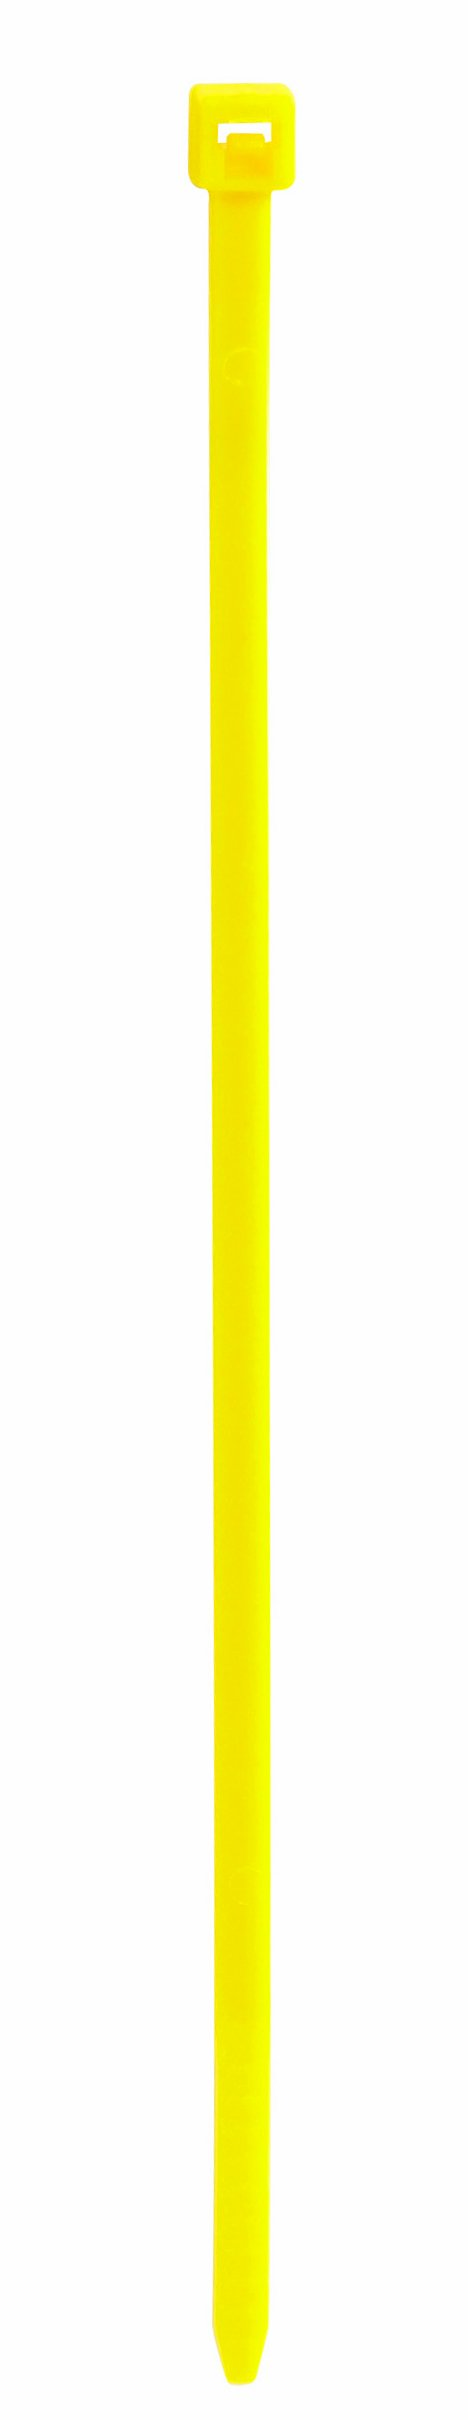 Aviditi CT145J Nylon Cable Tie, 14'' Length x 3/16'' Width, Fluorescent Yellow (Case of 1000)